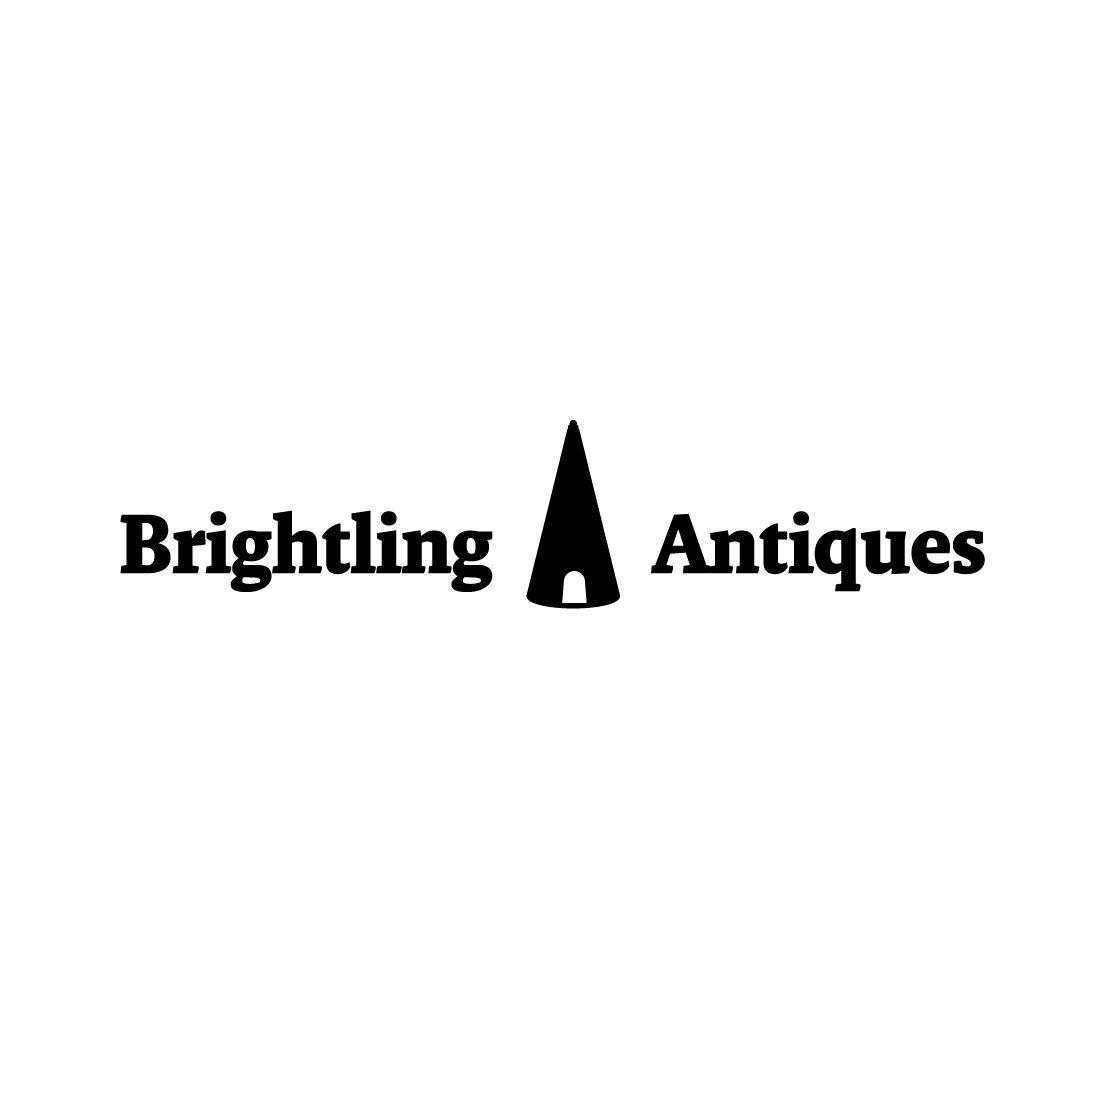 Brightling Antiques & Interiors